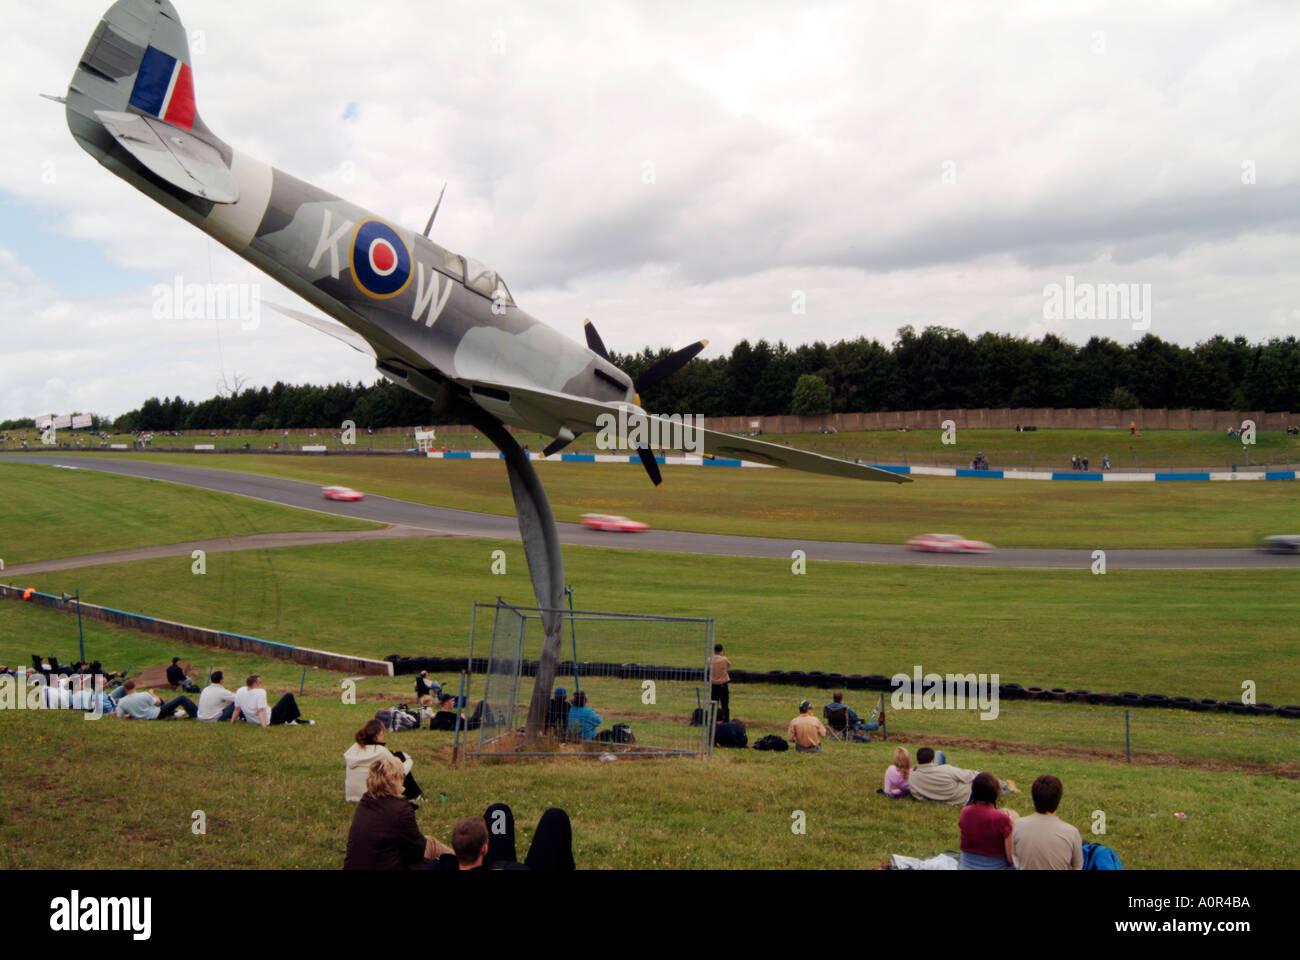 spitfire at castle donnington race circuit spritire world war two